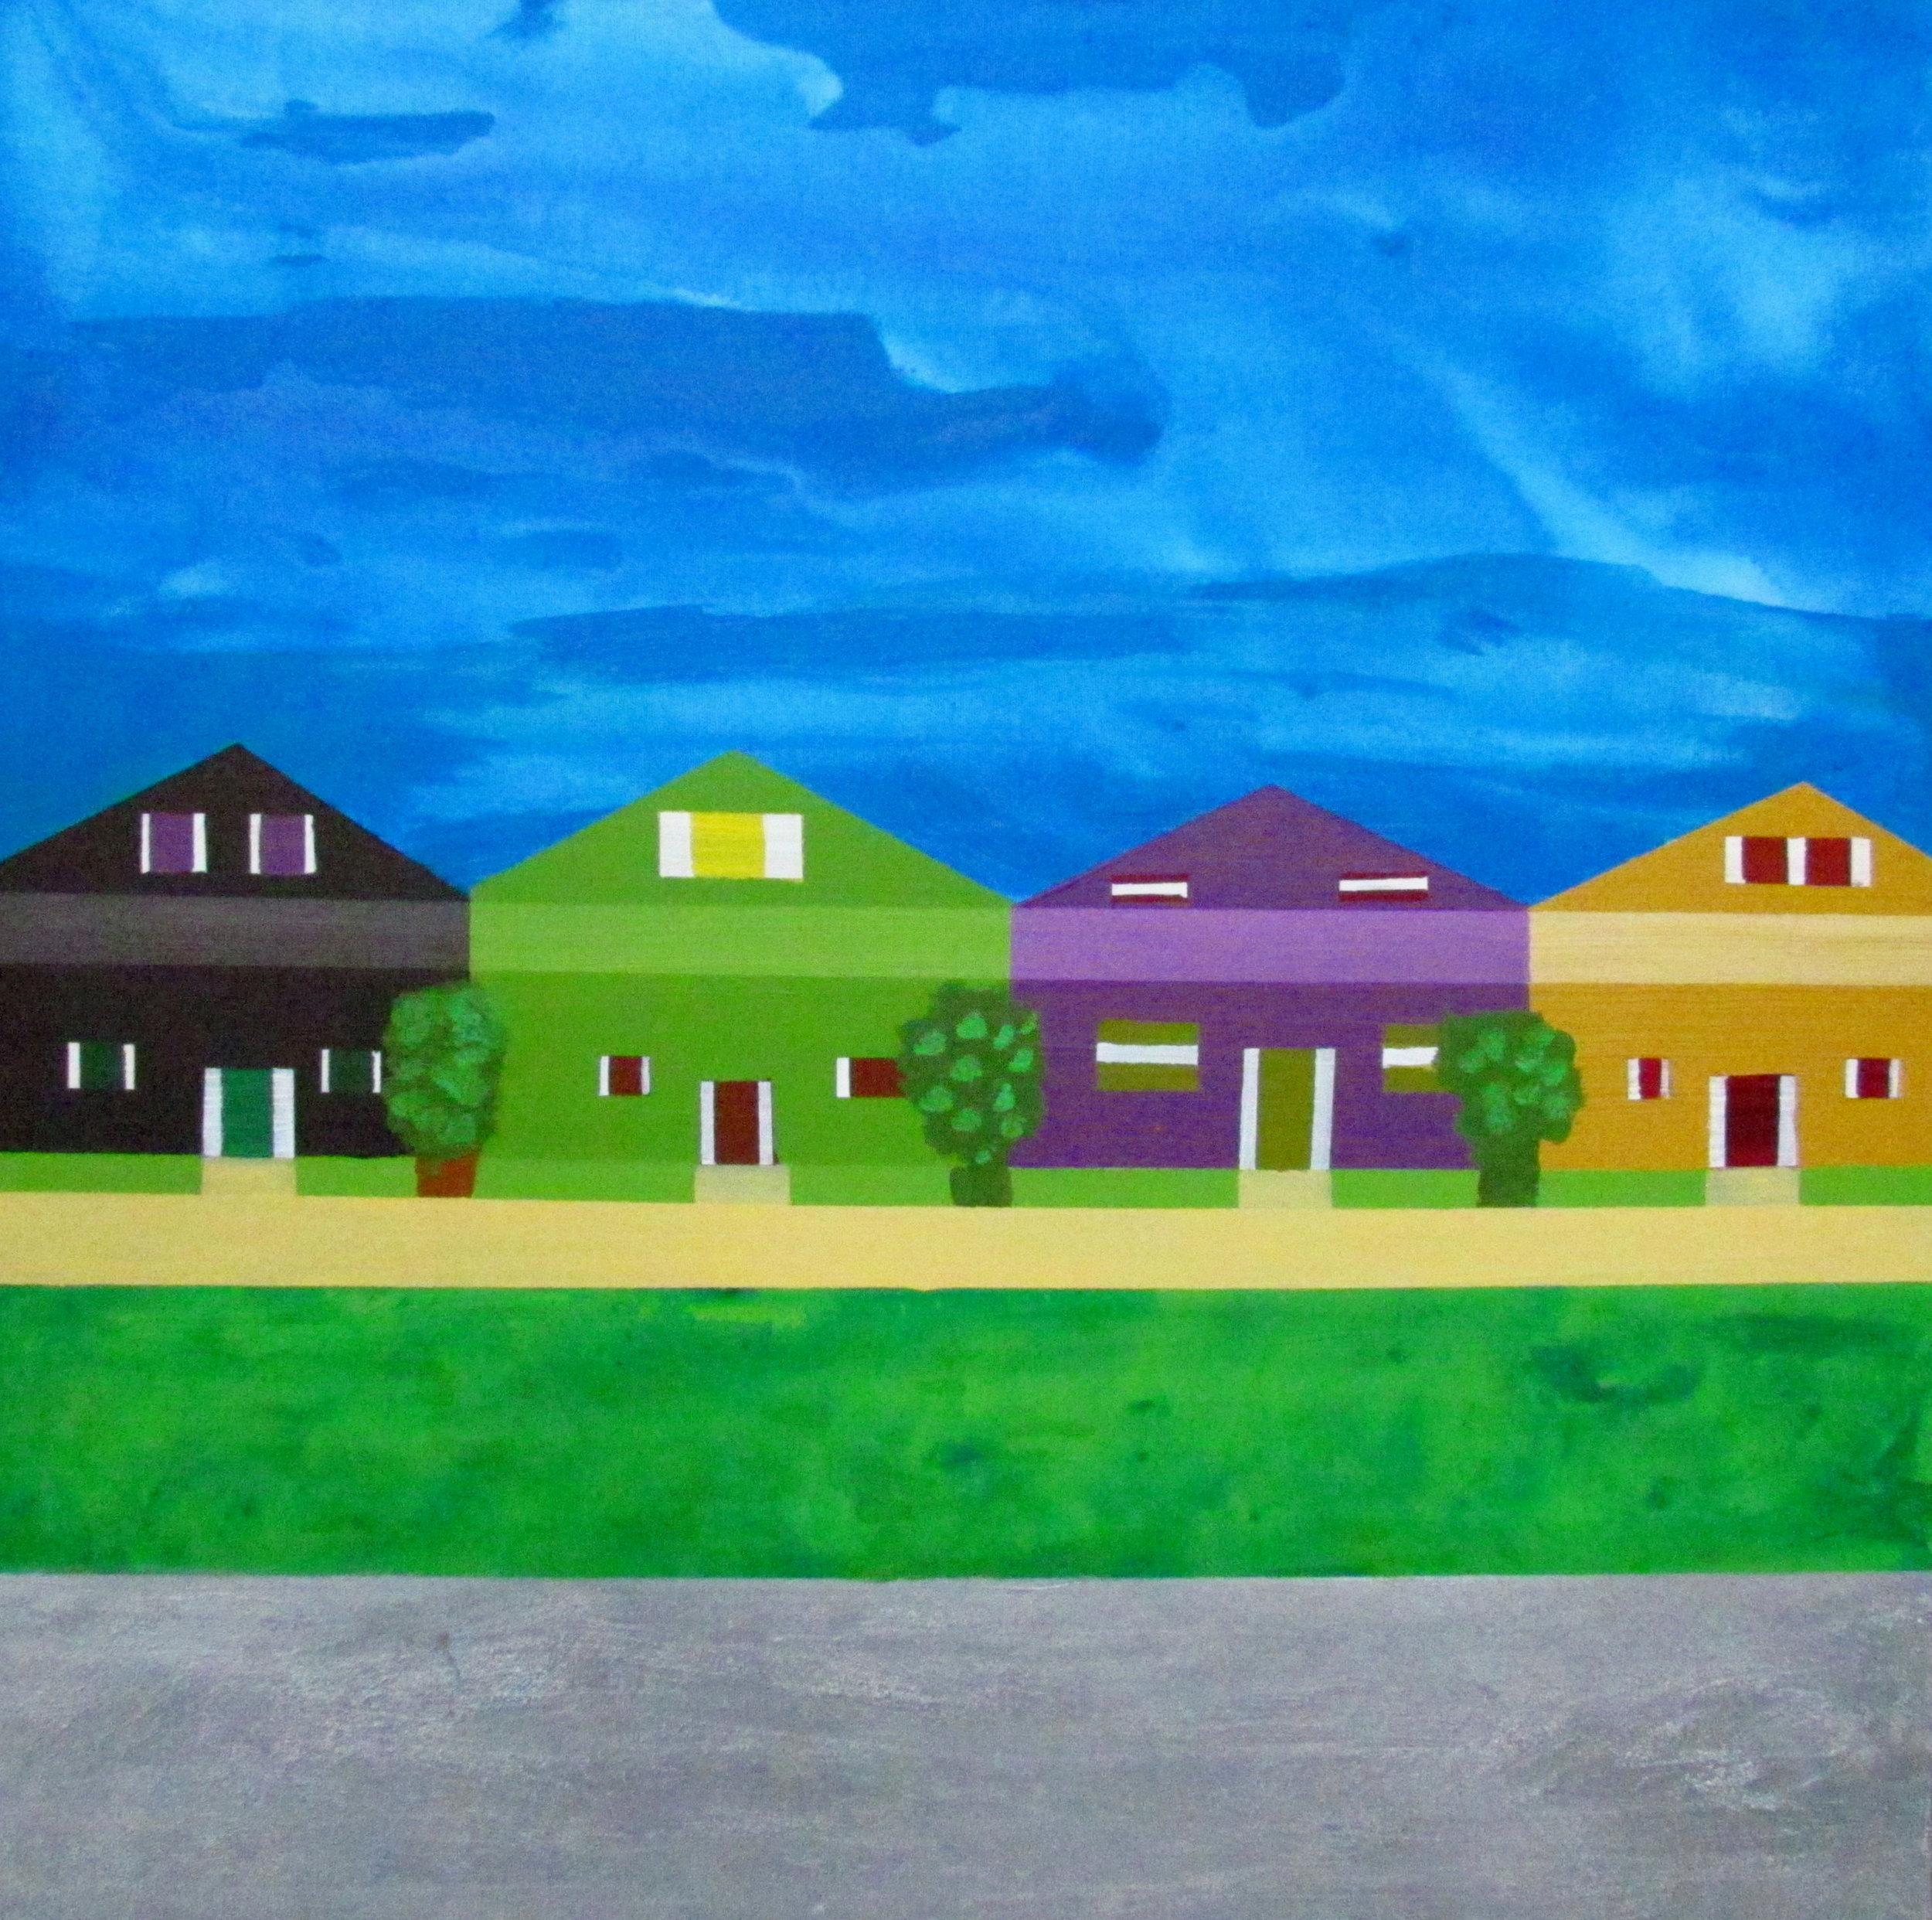 16 2016 Middle Class Neighbourhood, Acrylic on canvas, Yaniv Janson 76X76cm.JPG